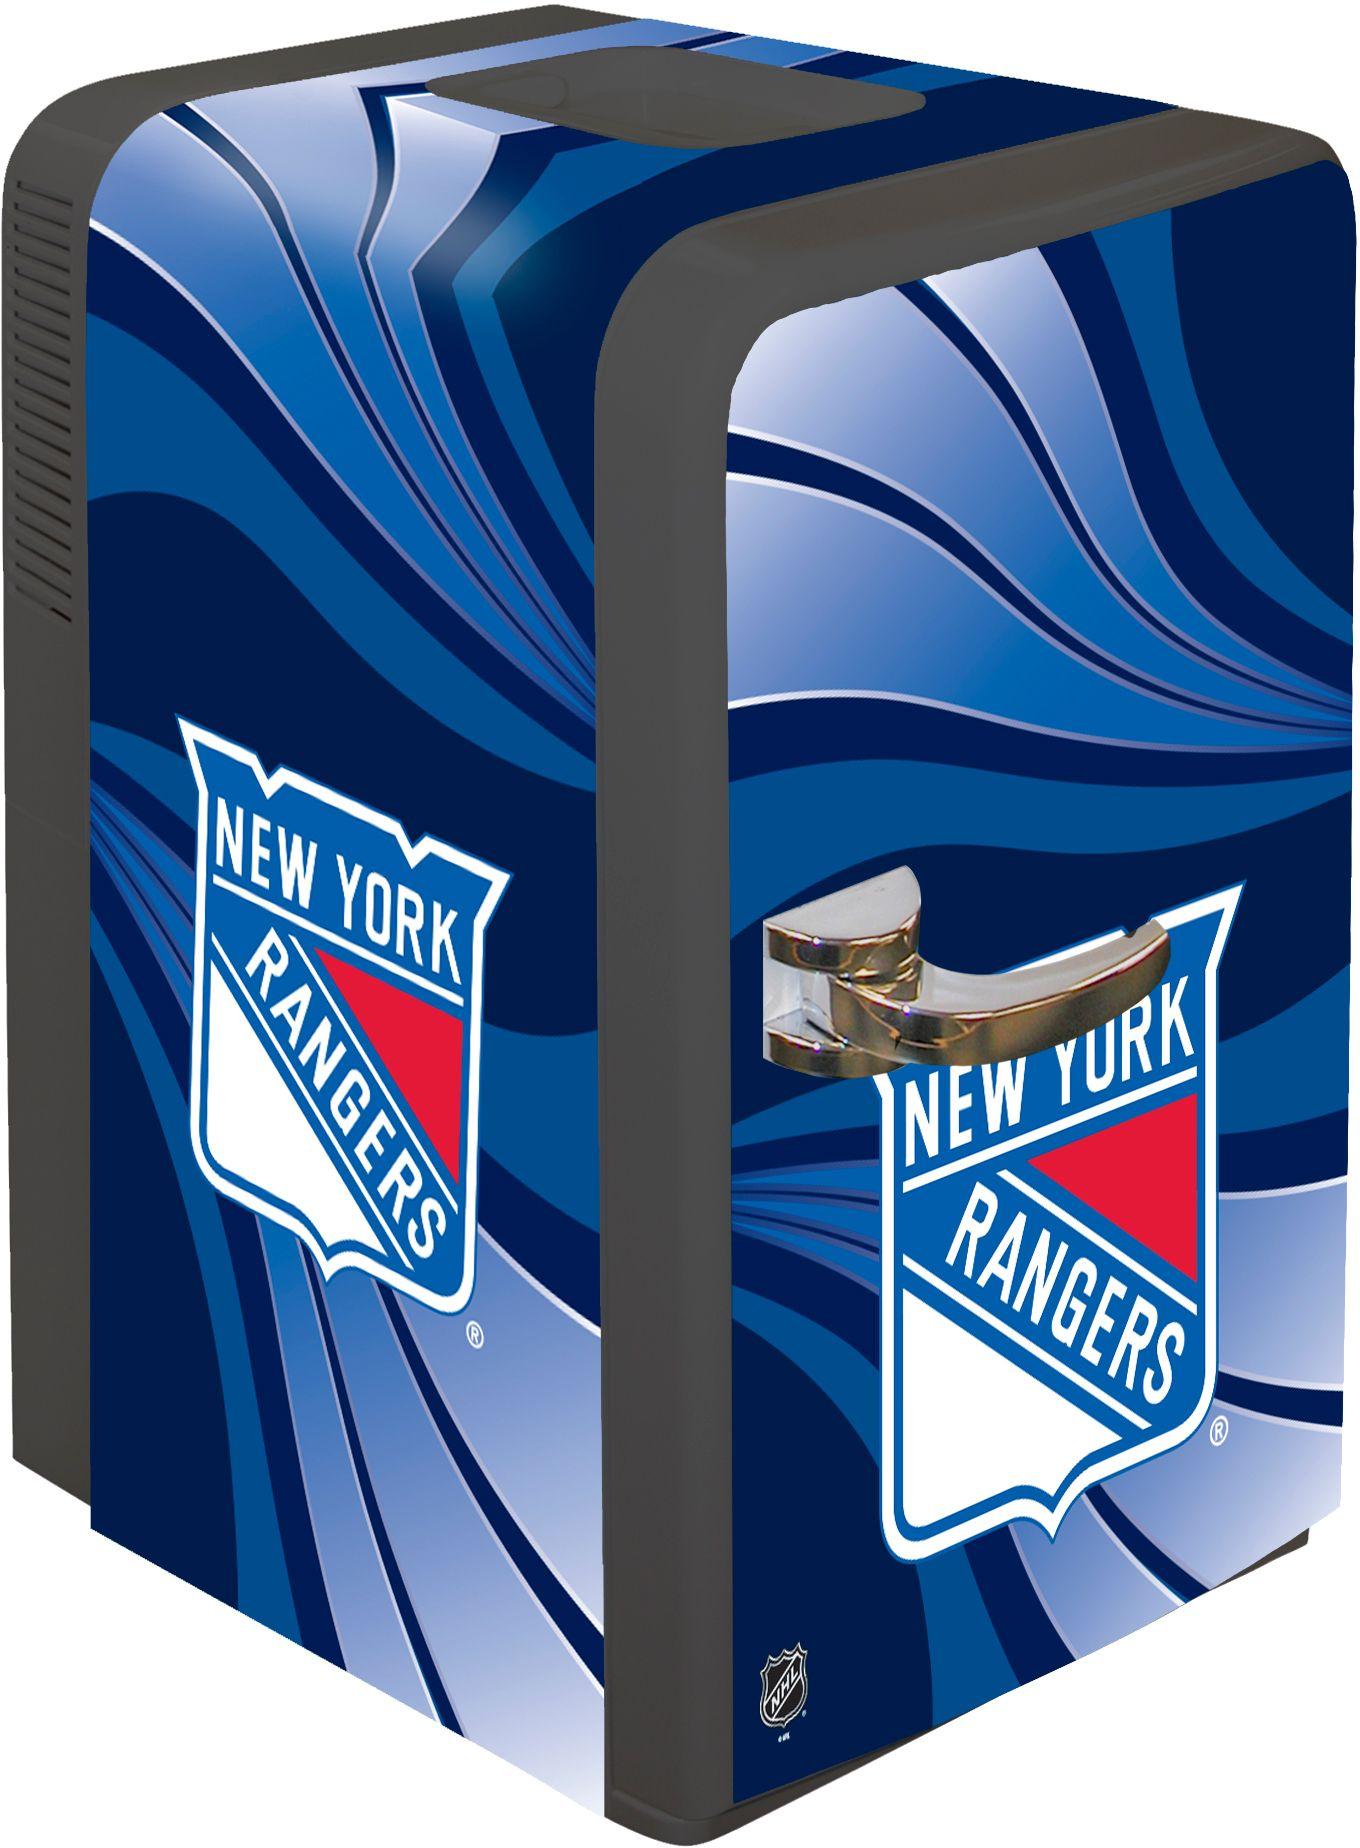 New York Rangers Accessories | Best Price Guarantee at DICK'S